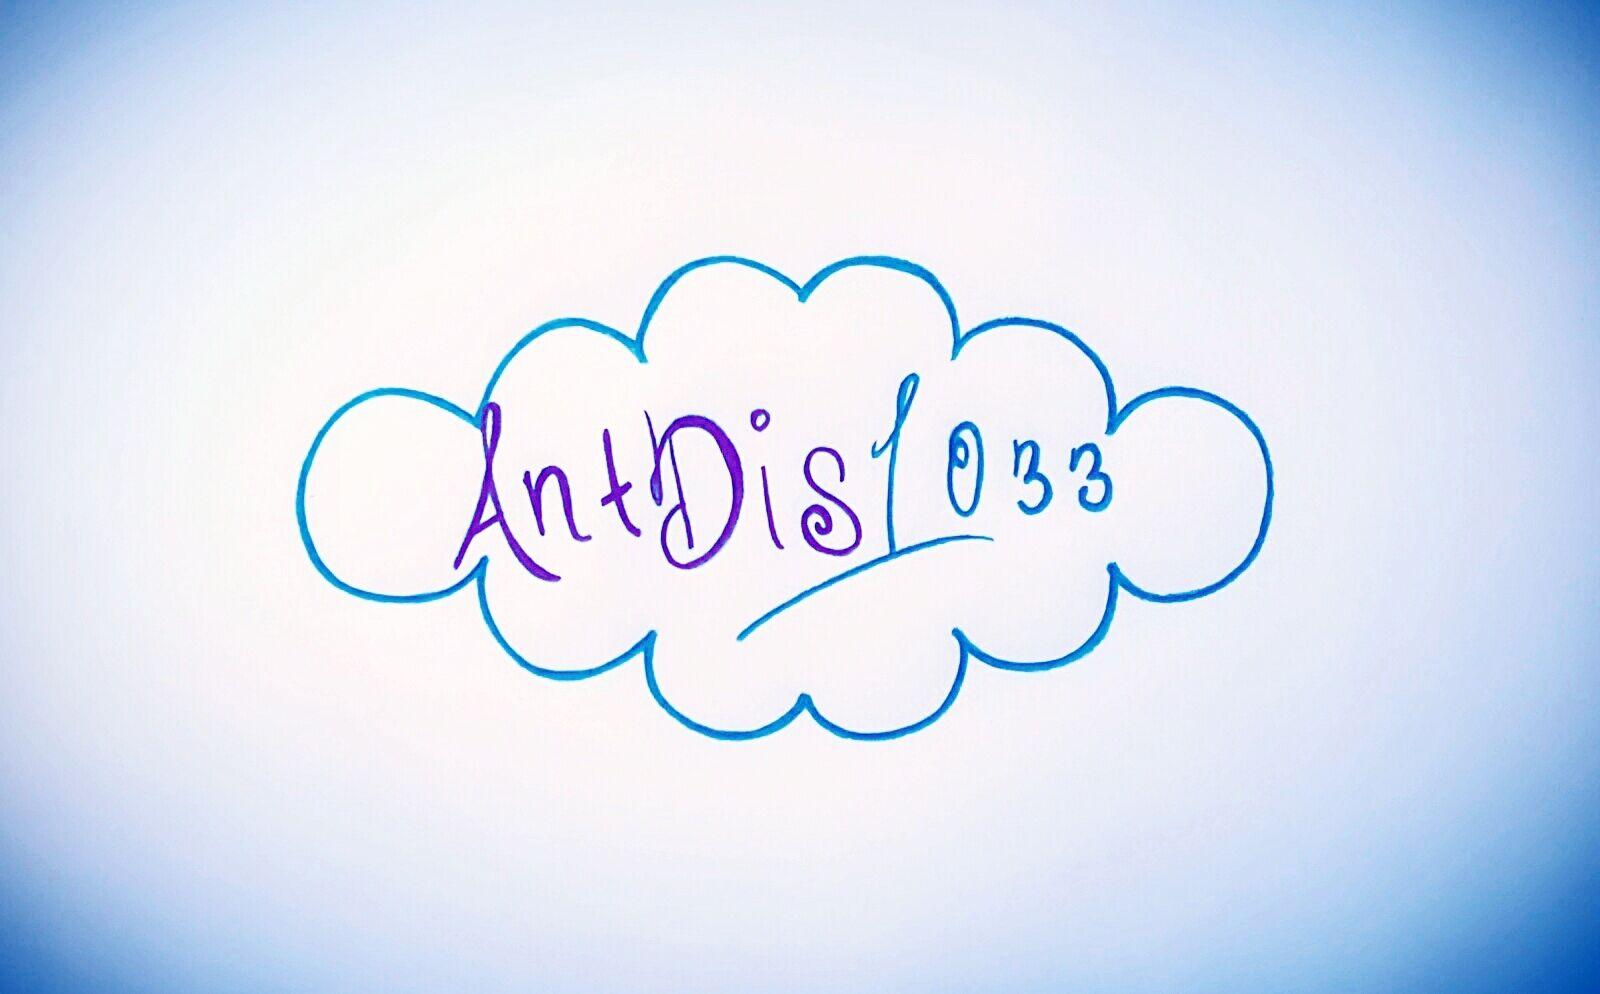 AntDis1033